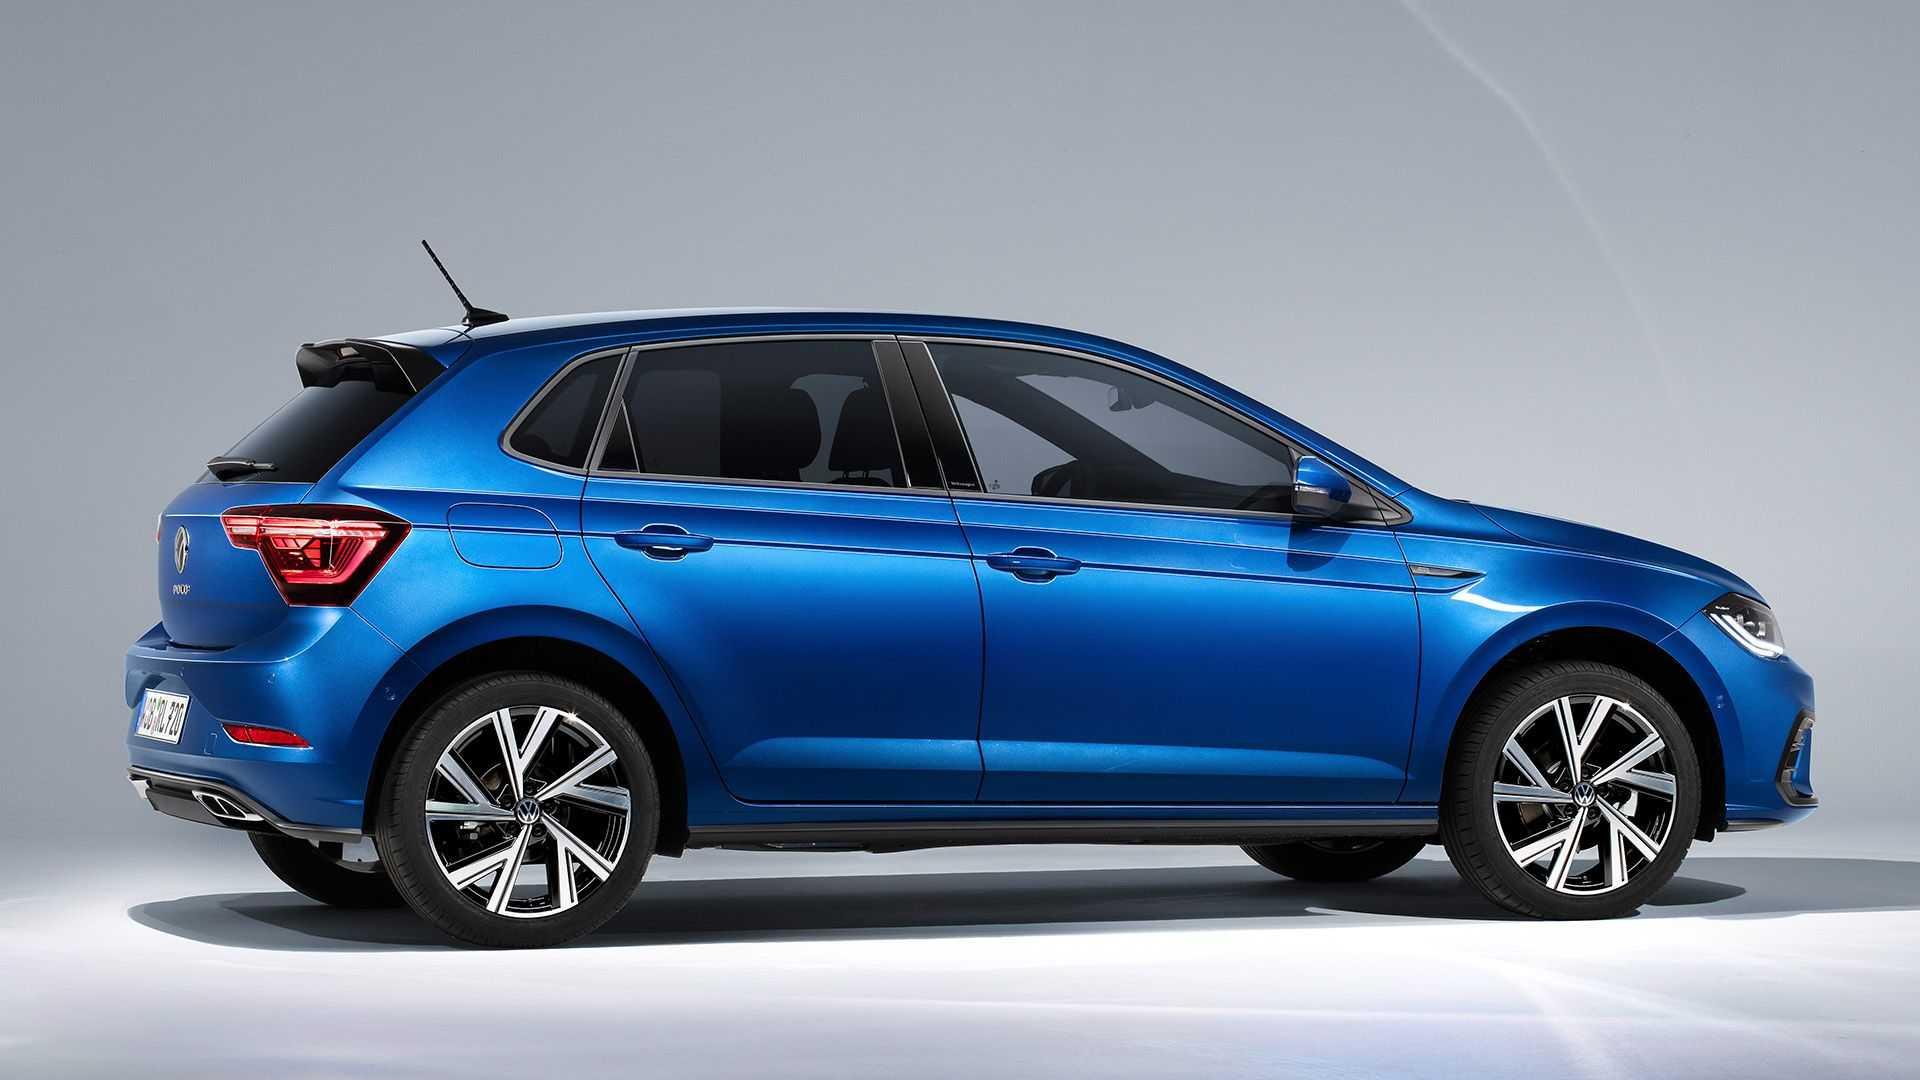 Volkswagen-Polo-facelift-2